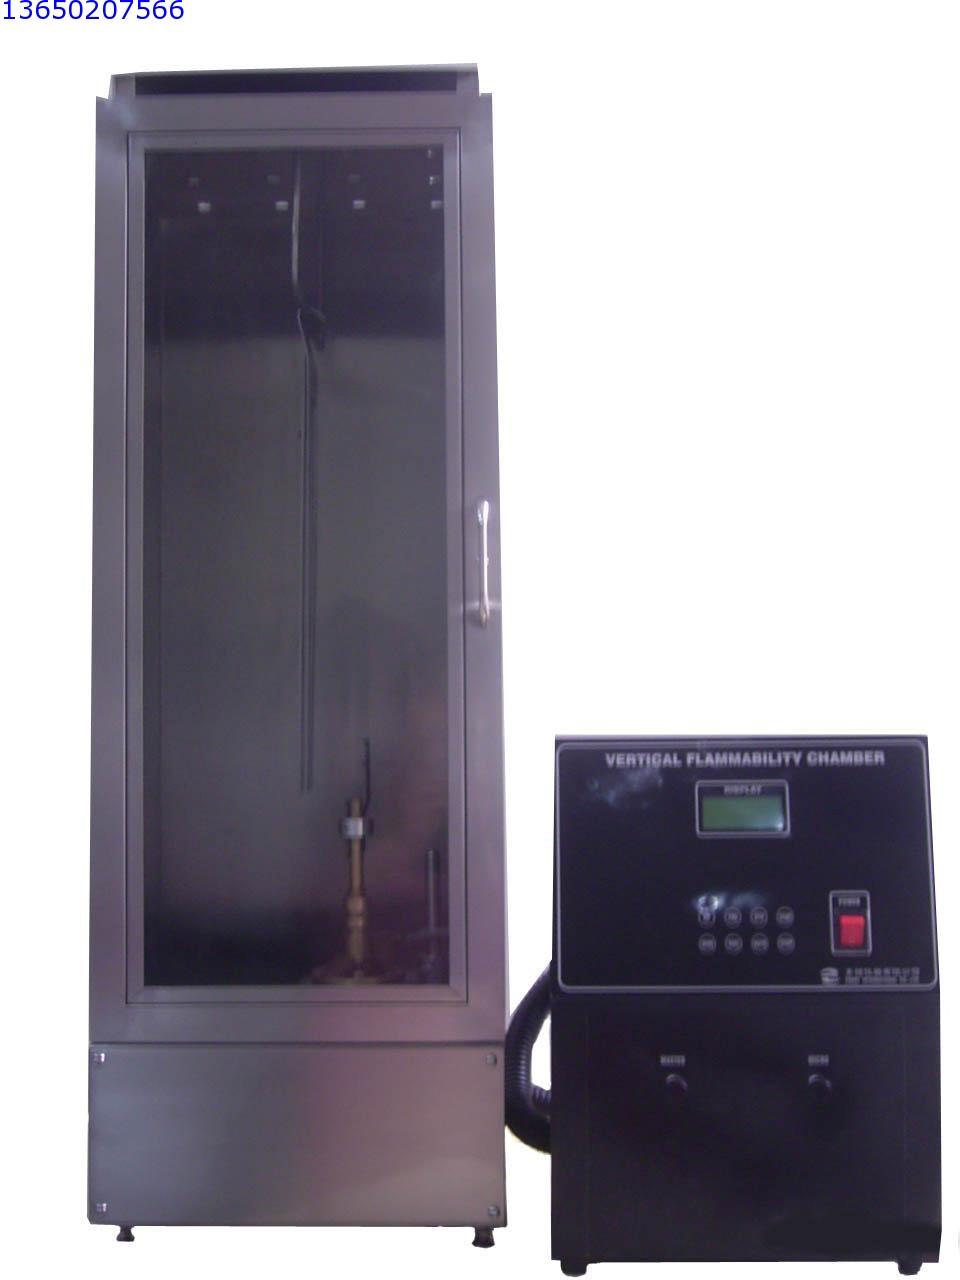 QI-S-018垂直法燃烧性测试仪